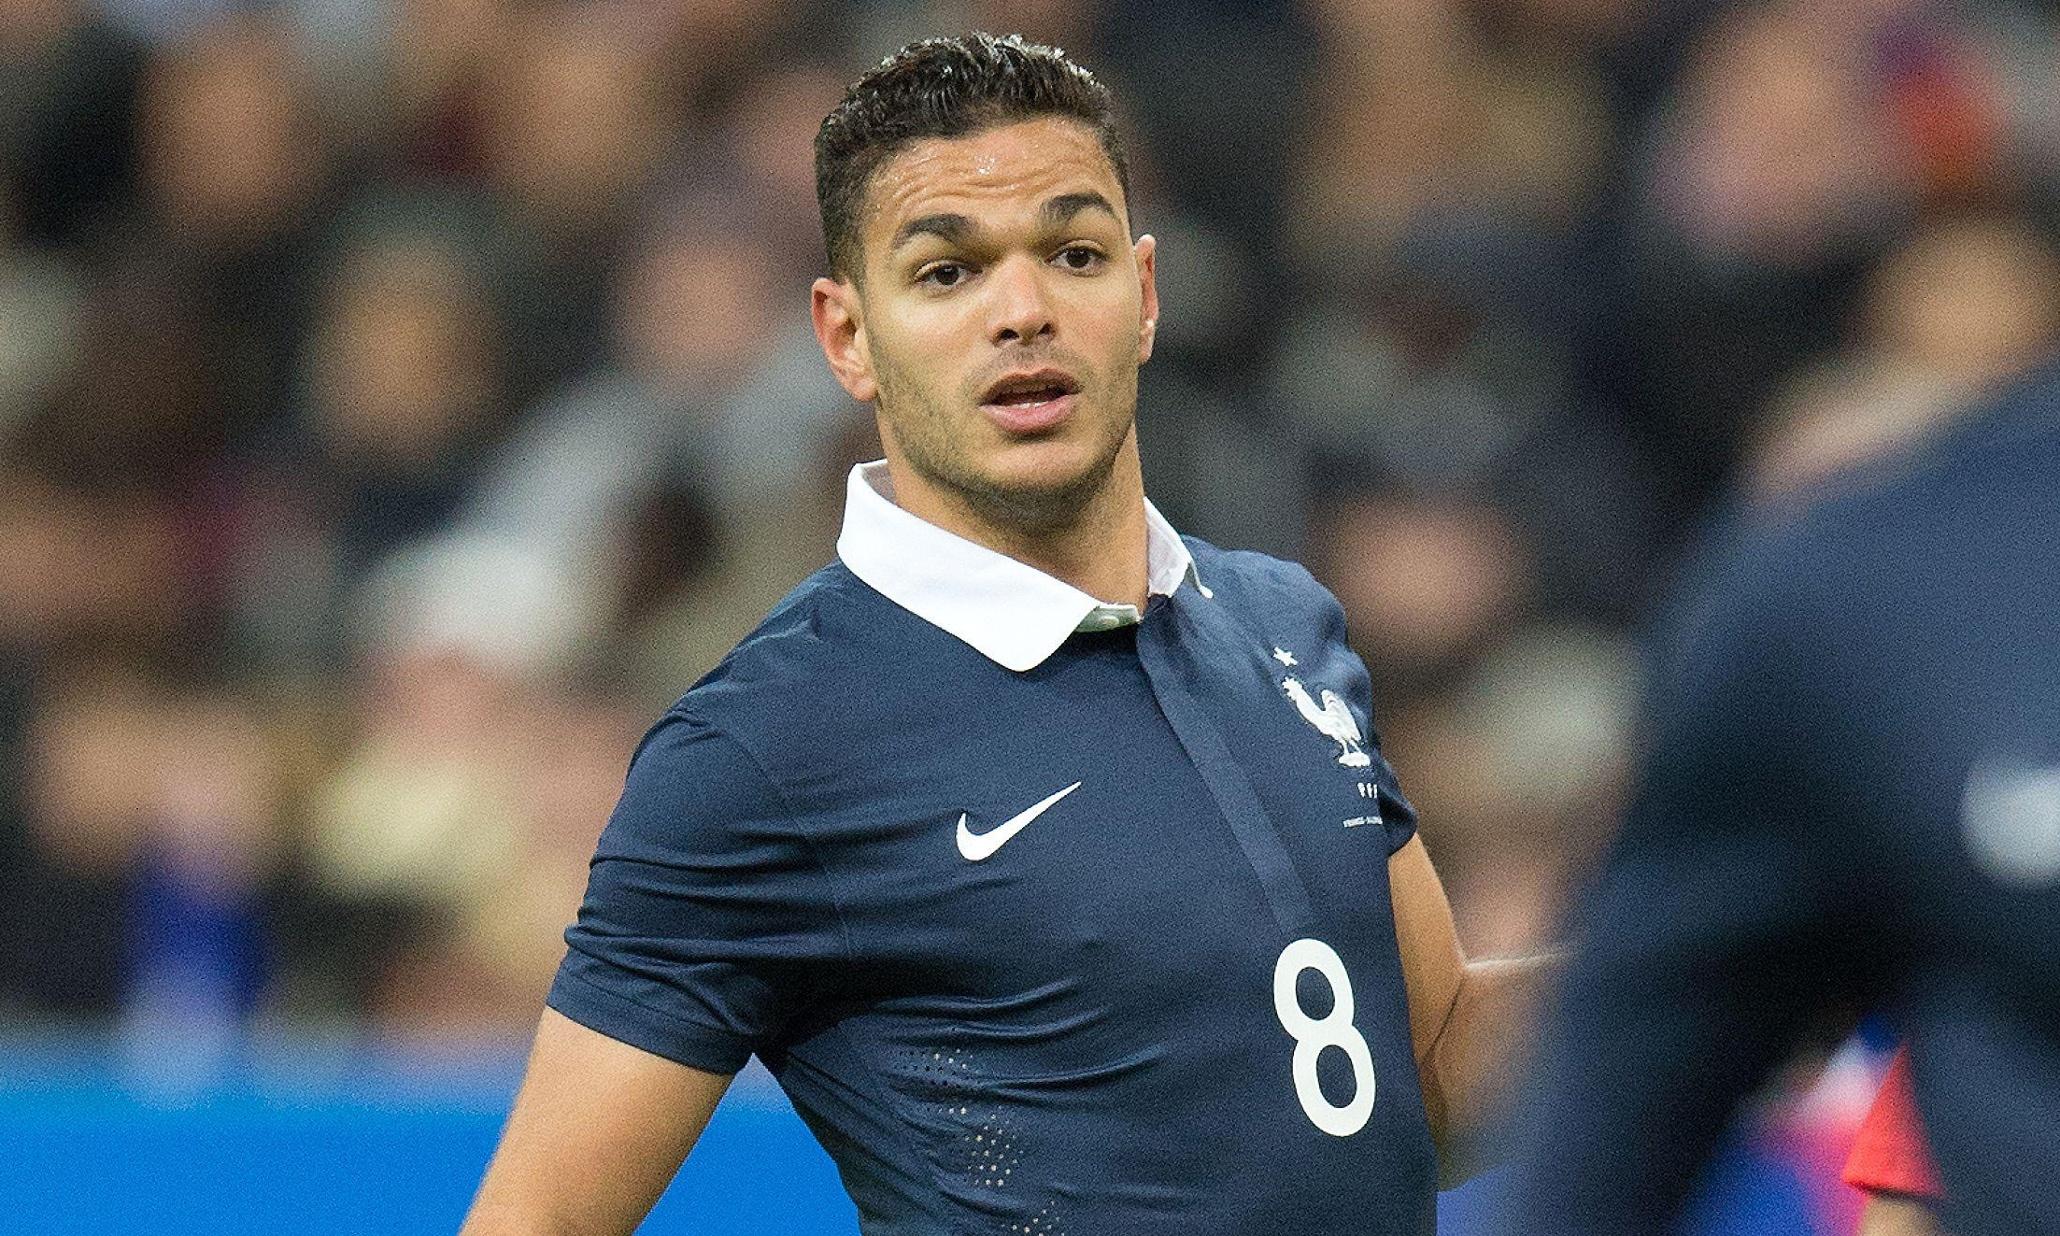 France v Germany, International football match, Stade de France, Paris, France - 13 Nov 2015